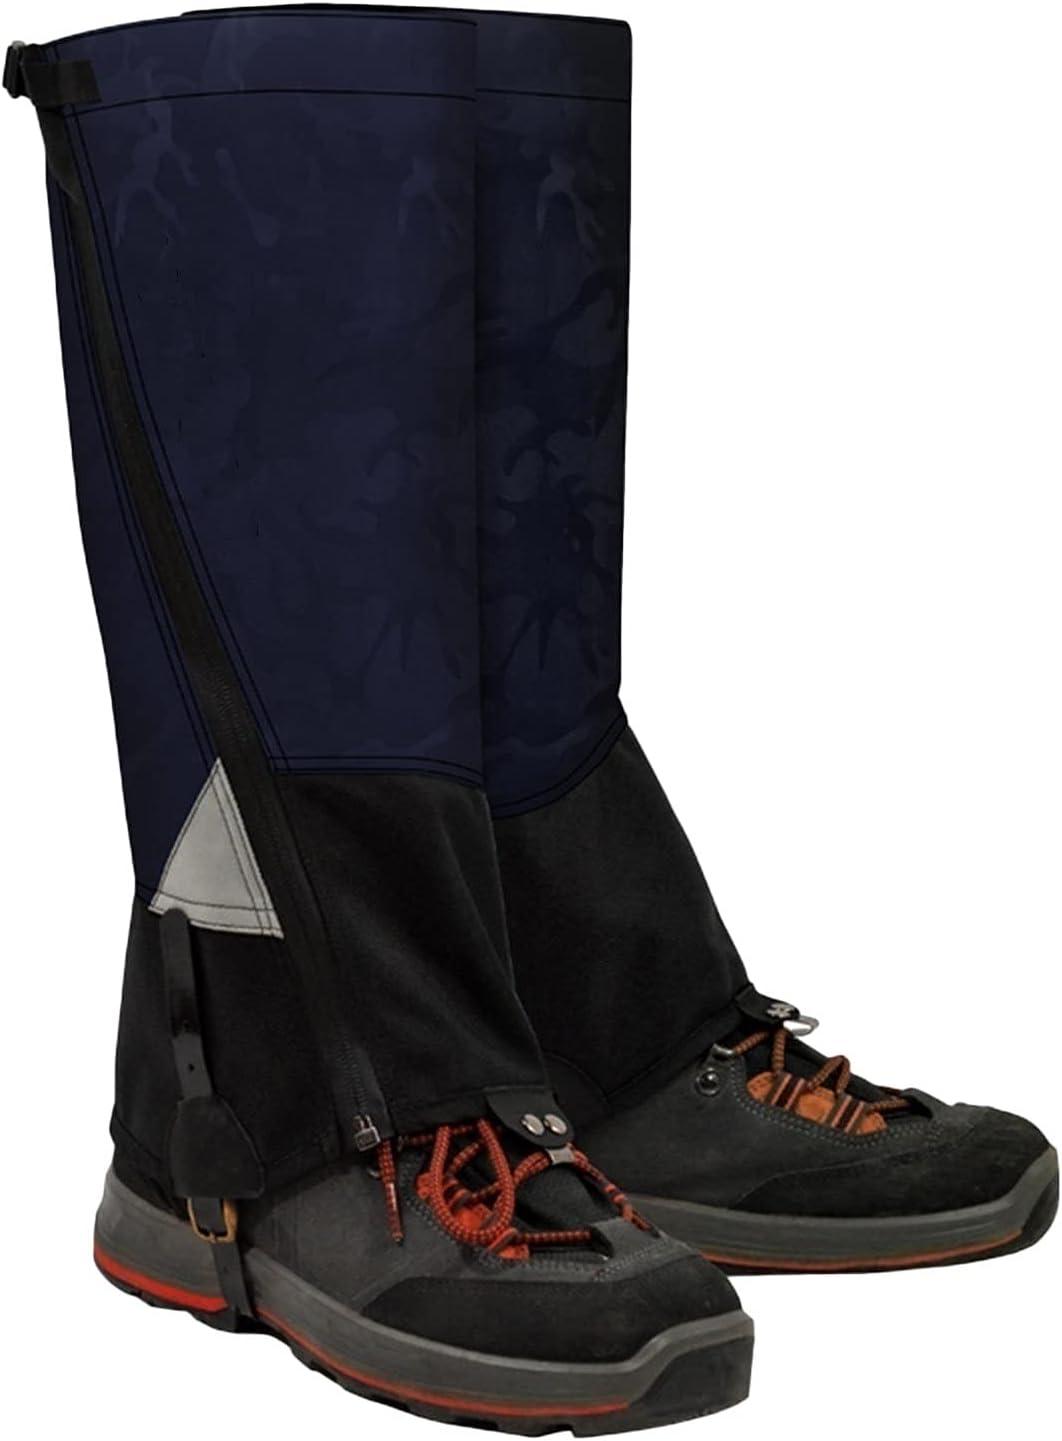 HYBHM Four Seasons Universal Leggings Waterpro Outdoor Trekking Regular dealer quality assurance